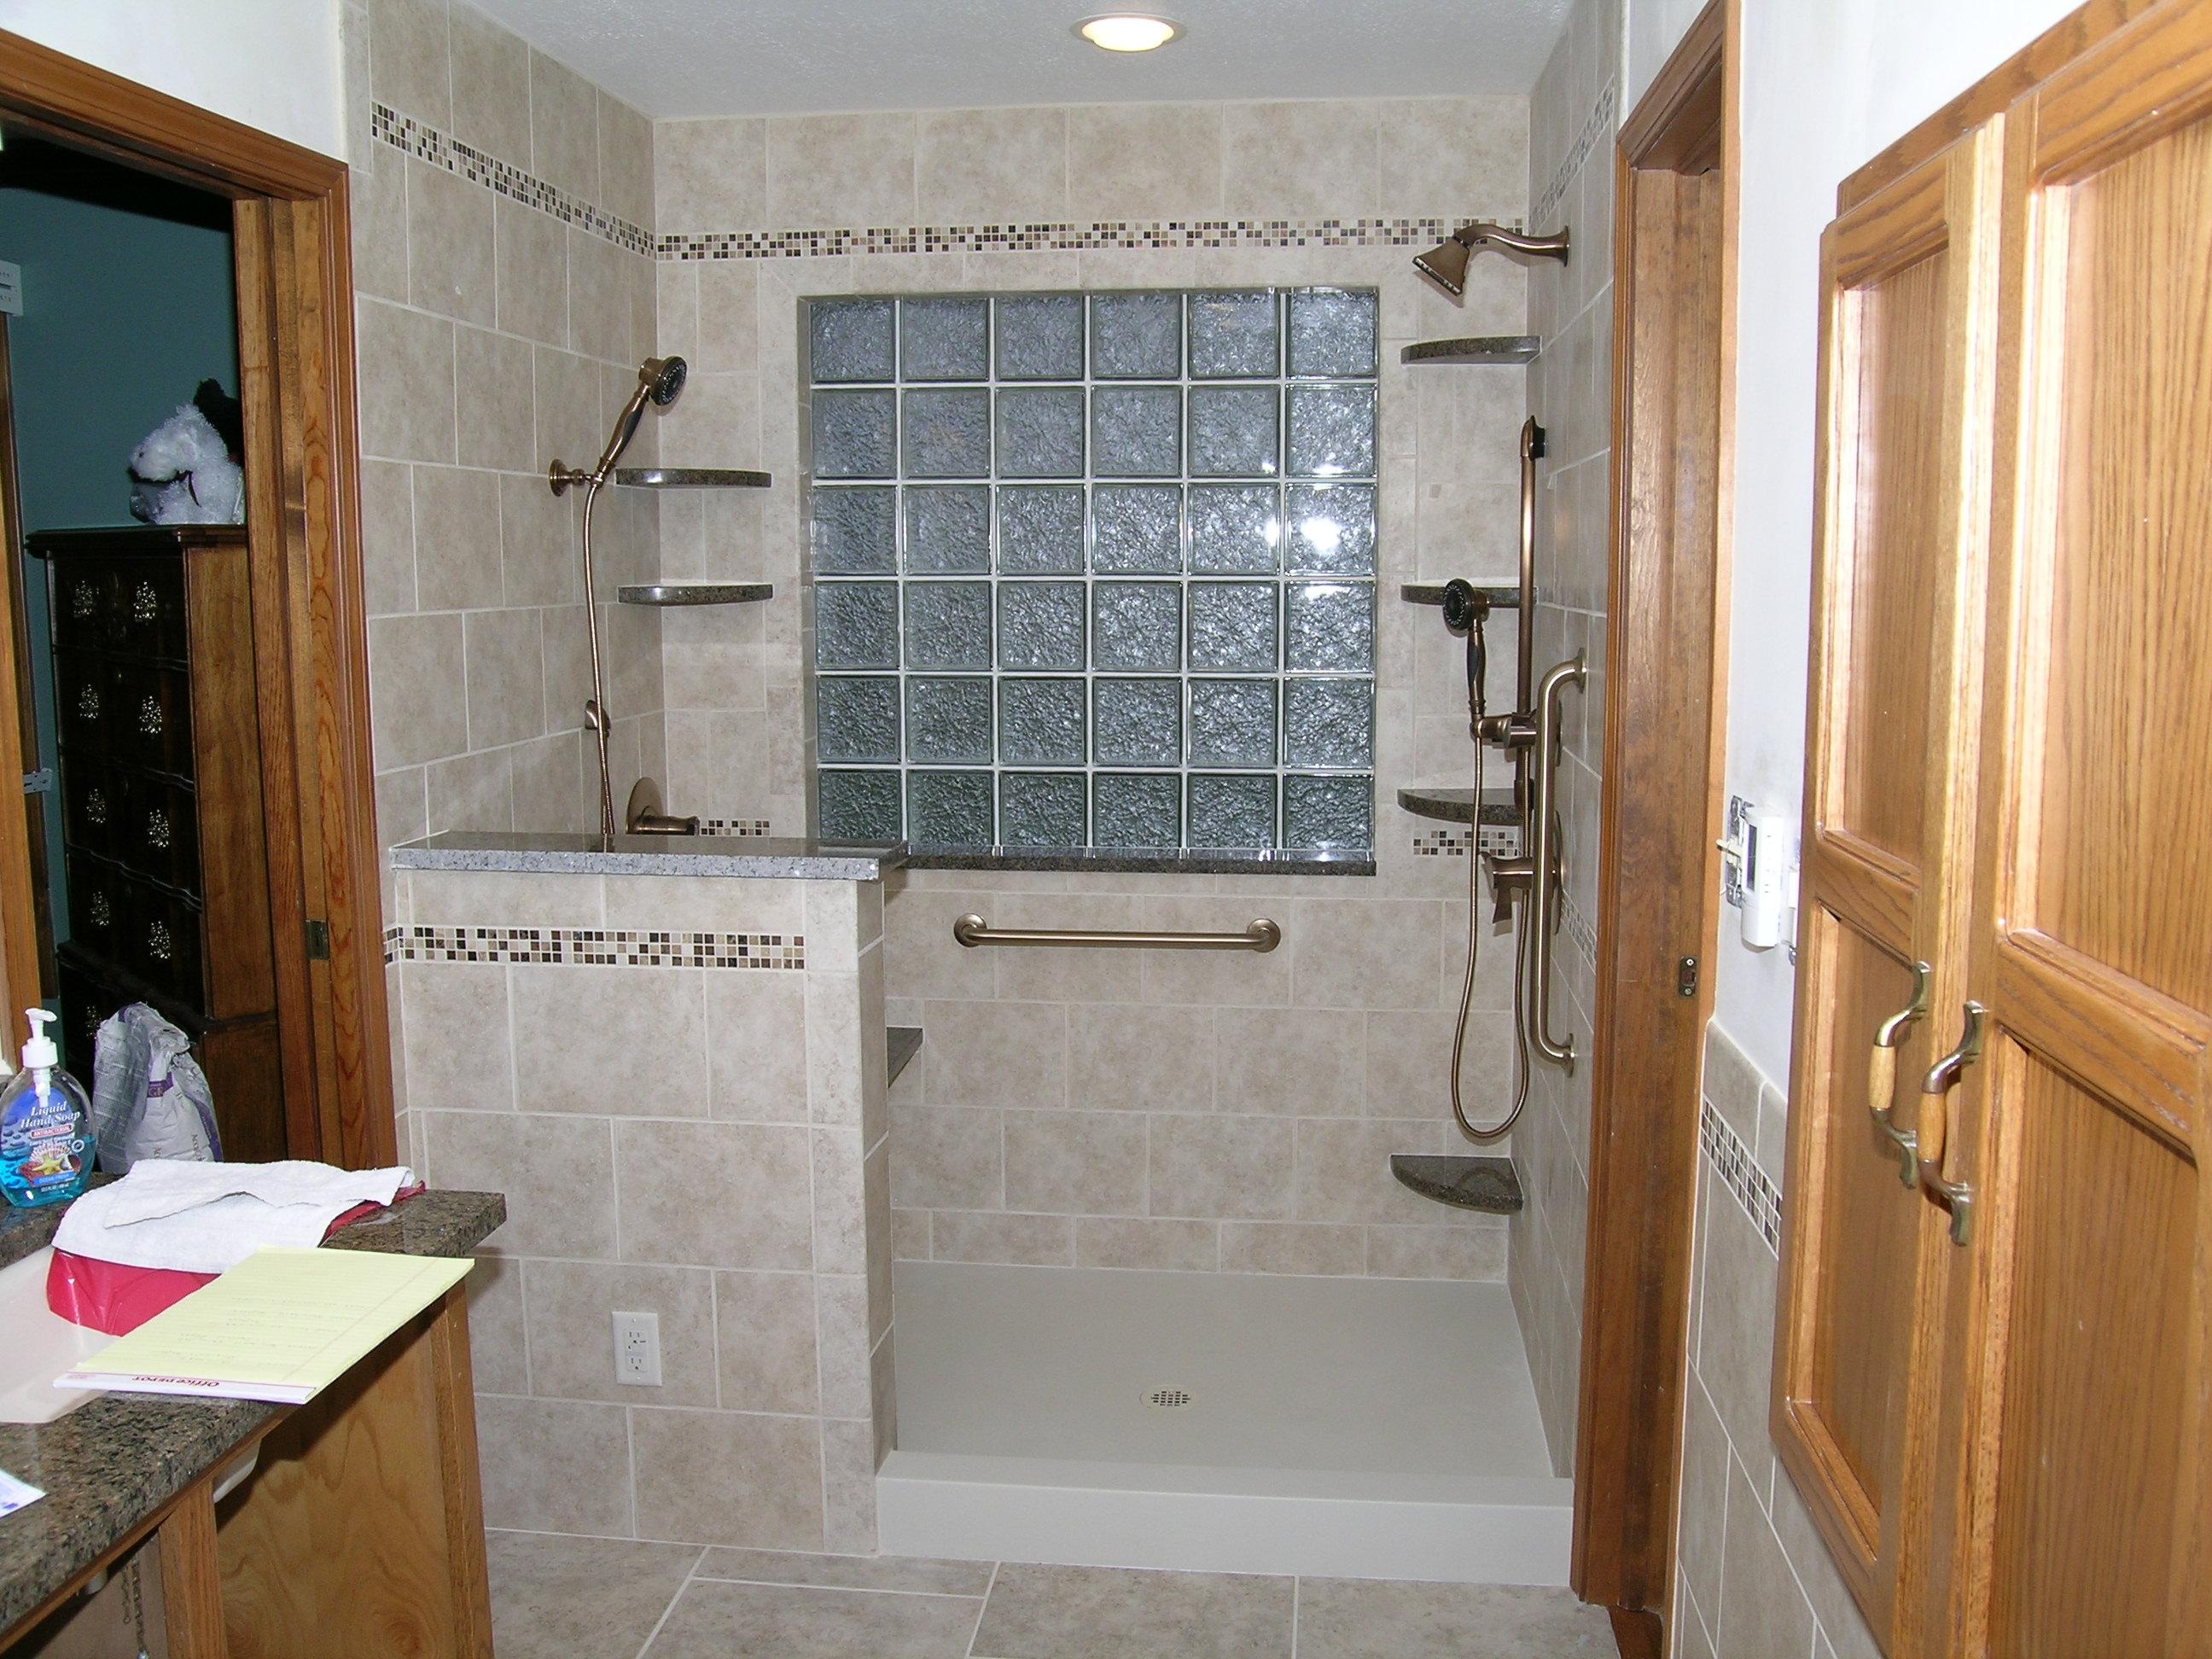 Updike Bathroom Remodeling Indianapolis In 46227